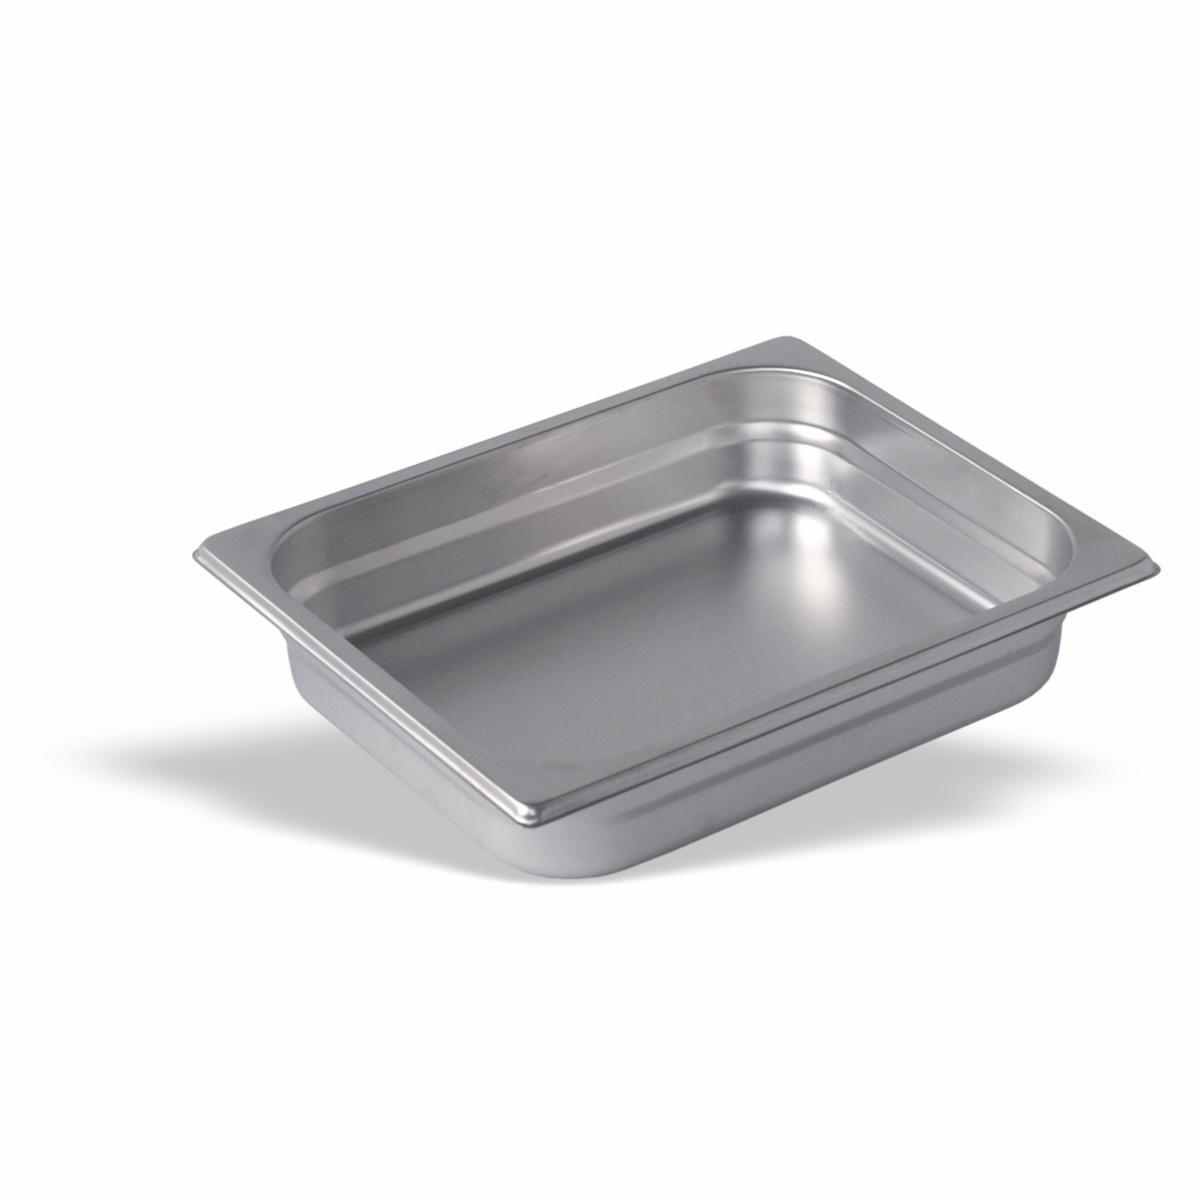 Bac inox 18/10 gn 1/2 6,50 cm 4,10 l Pujadas